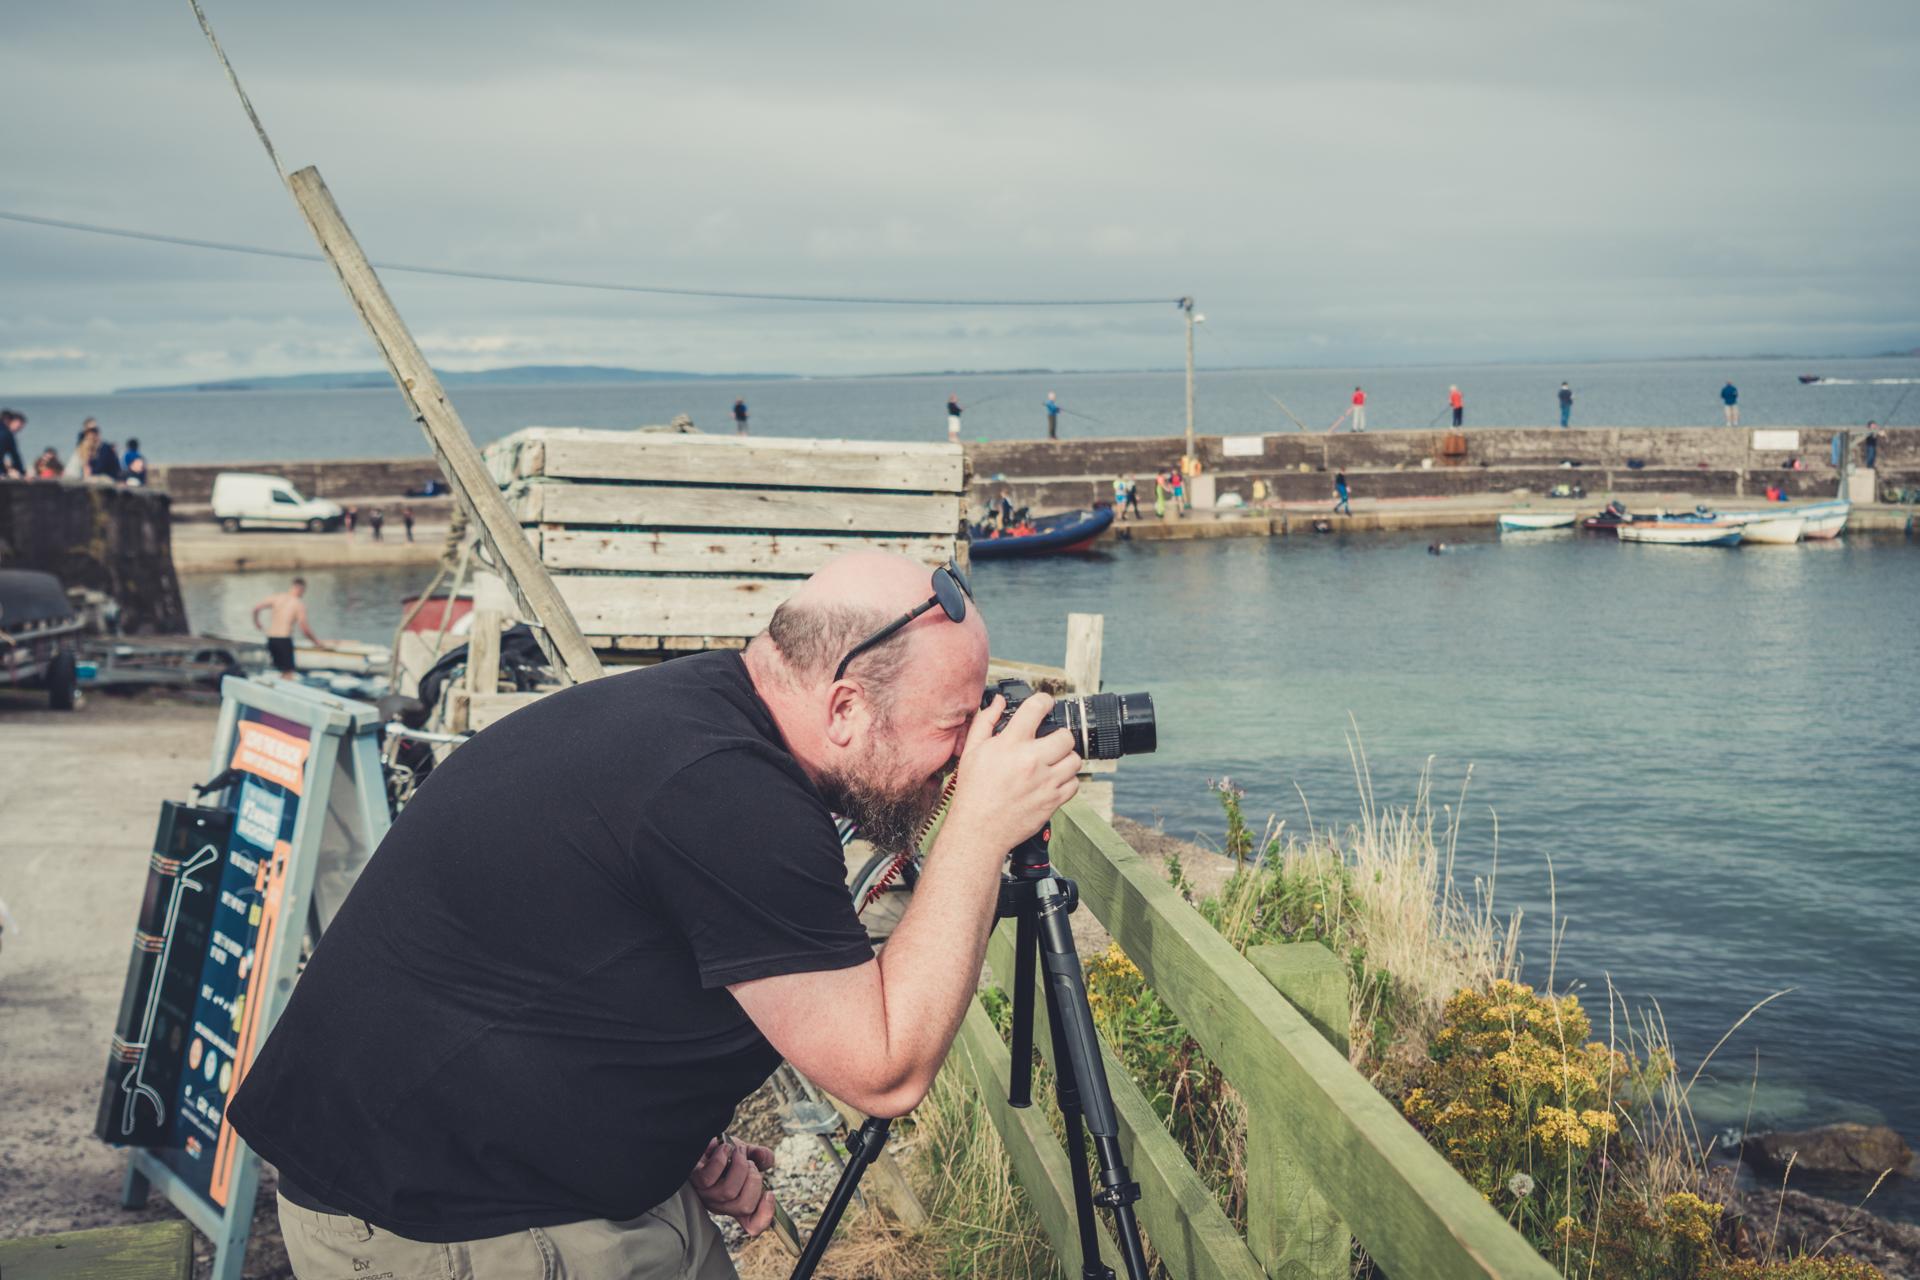 Ireland. Wild Atlantic Way. Kerry. Counthy Kerry. Travel photography. Landscape photography. Blog. Irish. Travelling Ireland. Ireland west coast. Wild Landscape. Trip. Vacation. -13.jpg